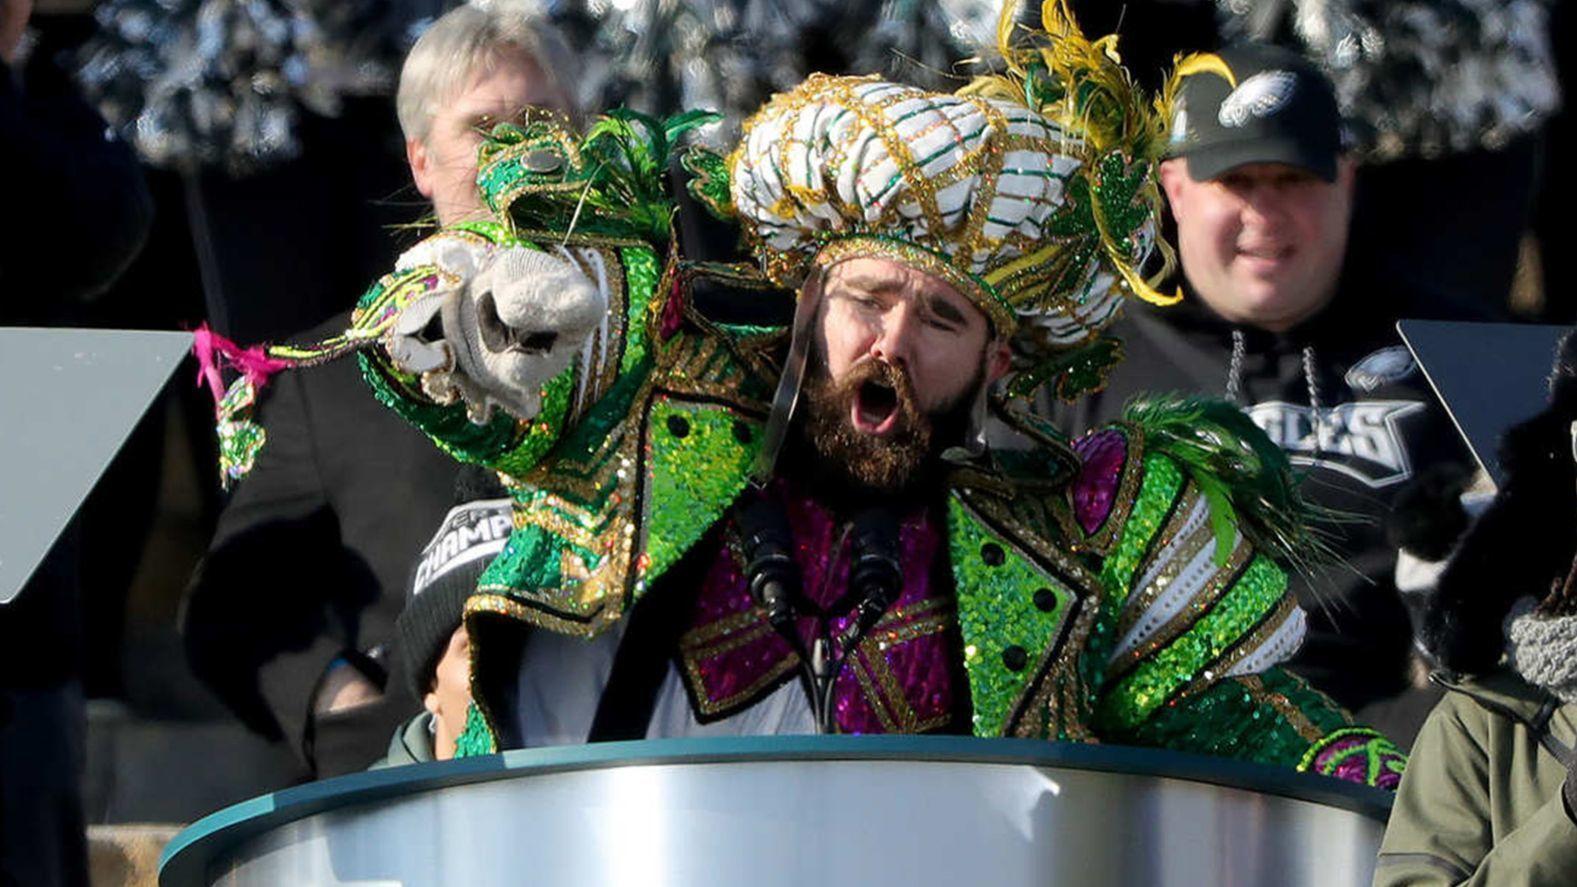 Jason Kelce s epic speech at the Philadelphia Eagles Super Bowl parade  (Read the transcript) - The Morning Call d2df4d495